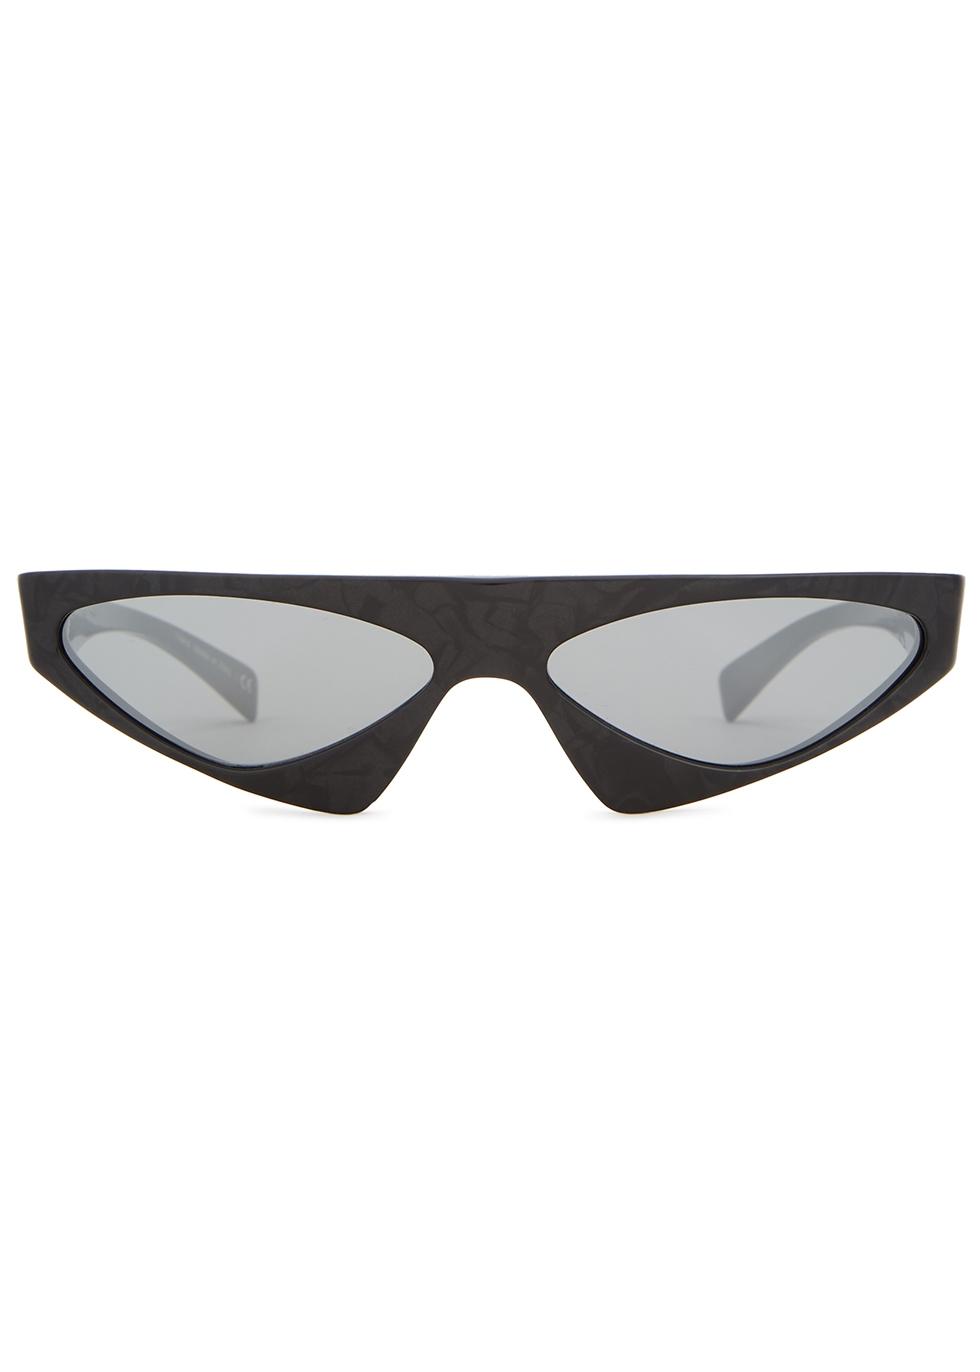 X Alexandre Vauthier Josseline sunglasses - ALAIN MIKLI